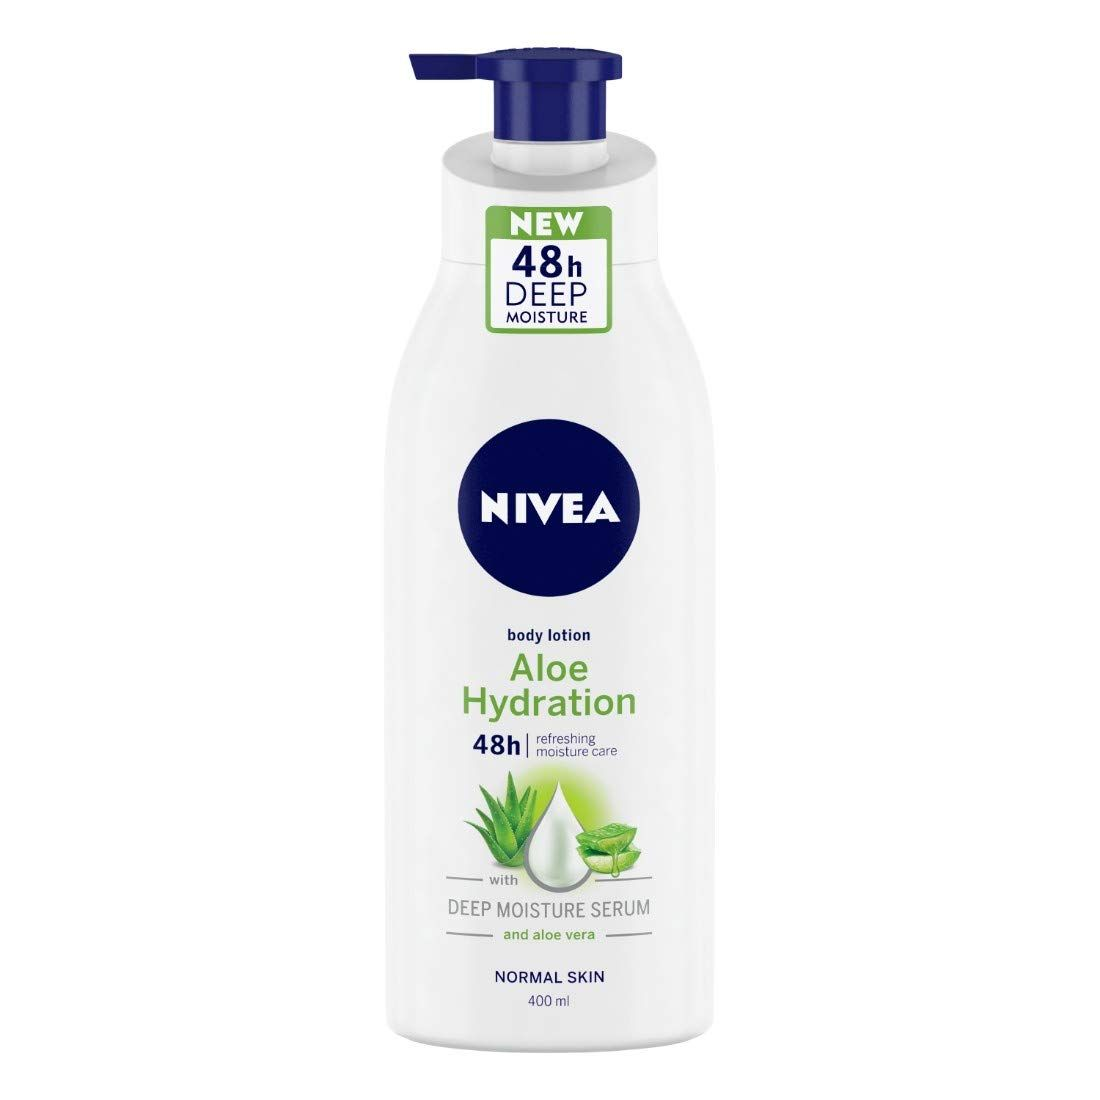 Lilium Herbal Hand Sanitizer Fliptop 30ml Pack Of 12 In 2020